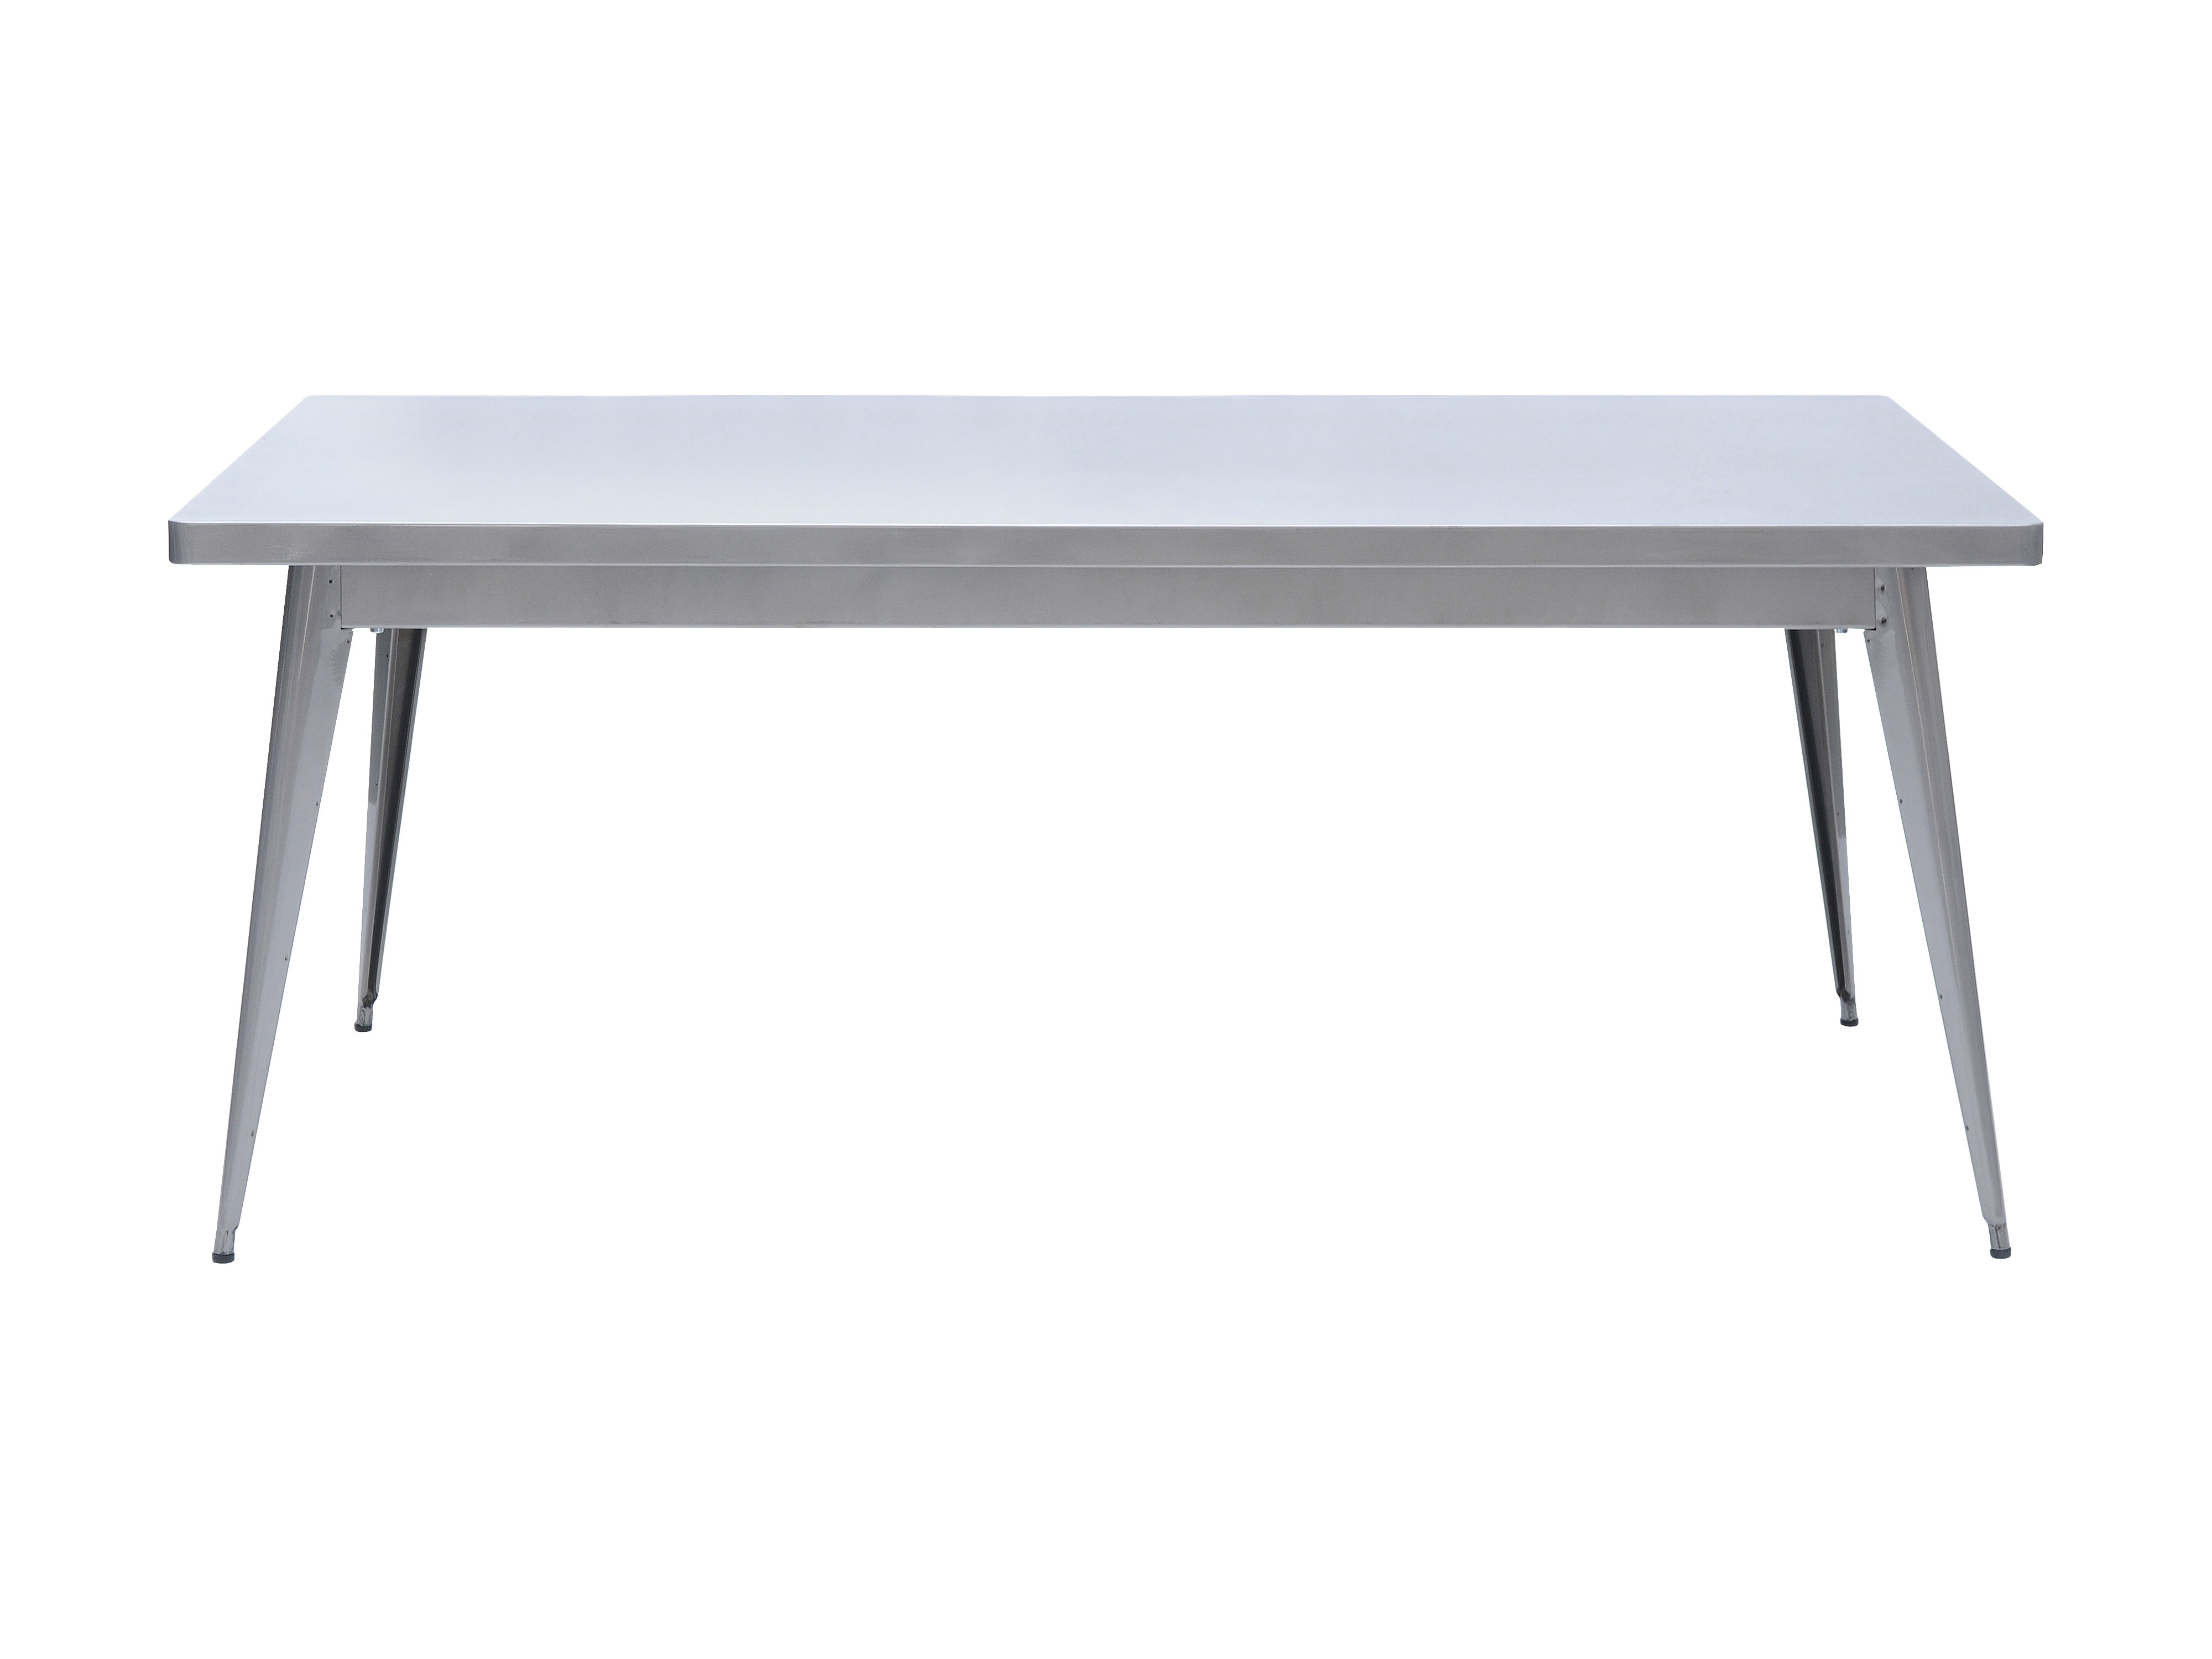 Rentrée 2011 UK - Bureau design - Table 55 / 130 x 70 cm - Pieds métal - Tolix - Acier brut verni brillant - Acier brut verni brillant